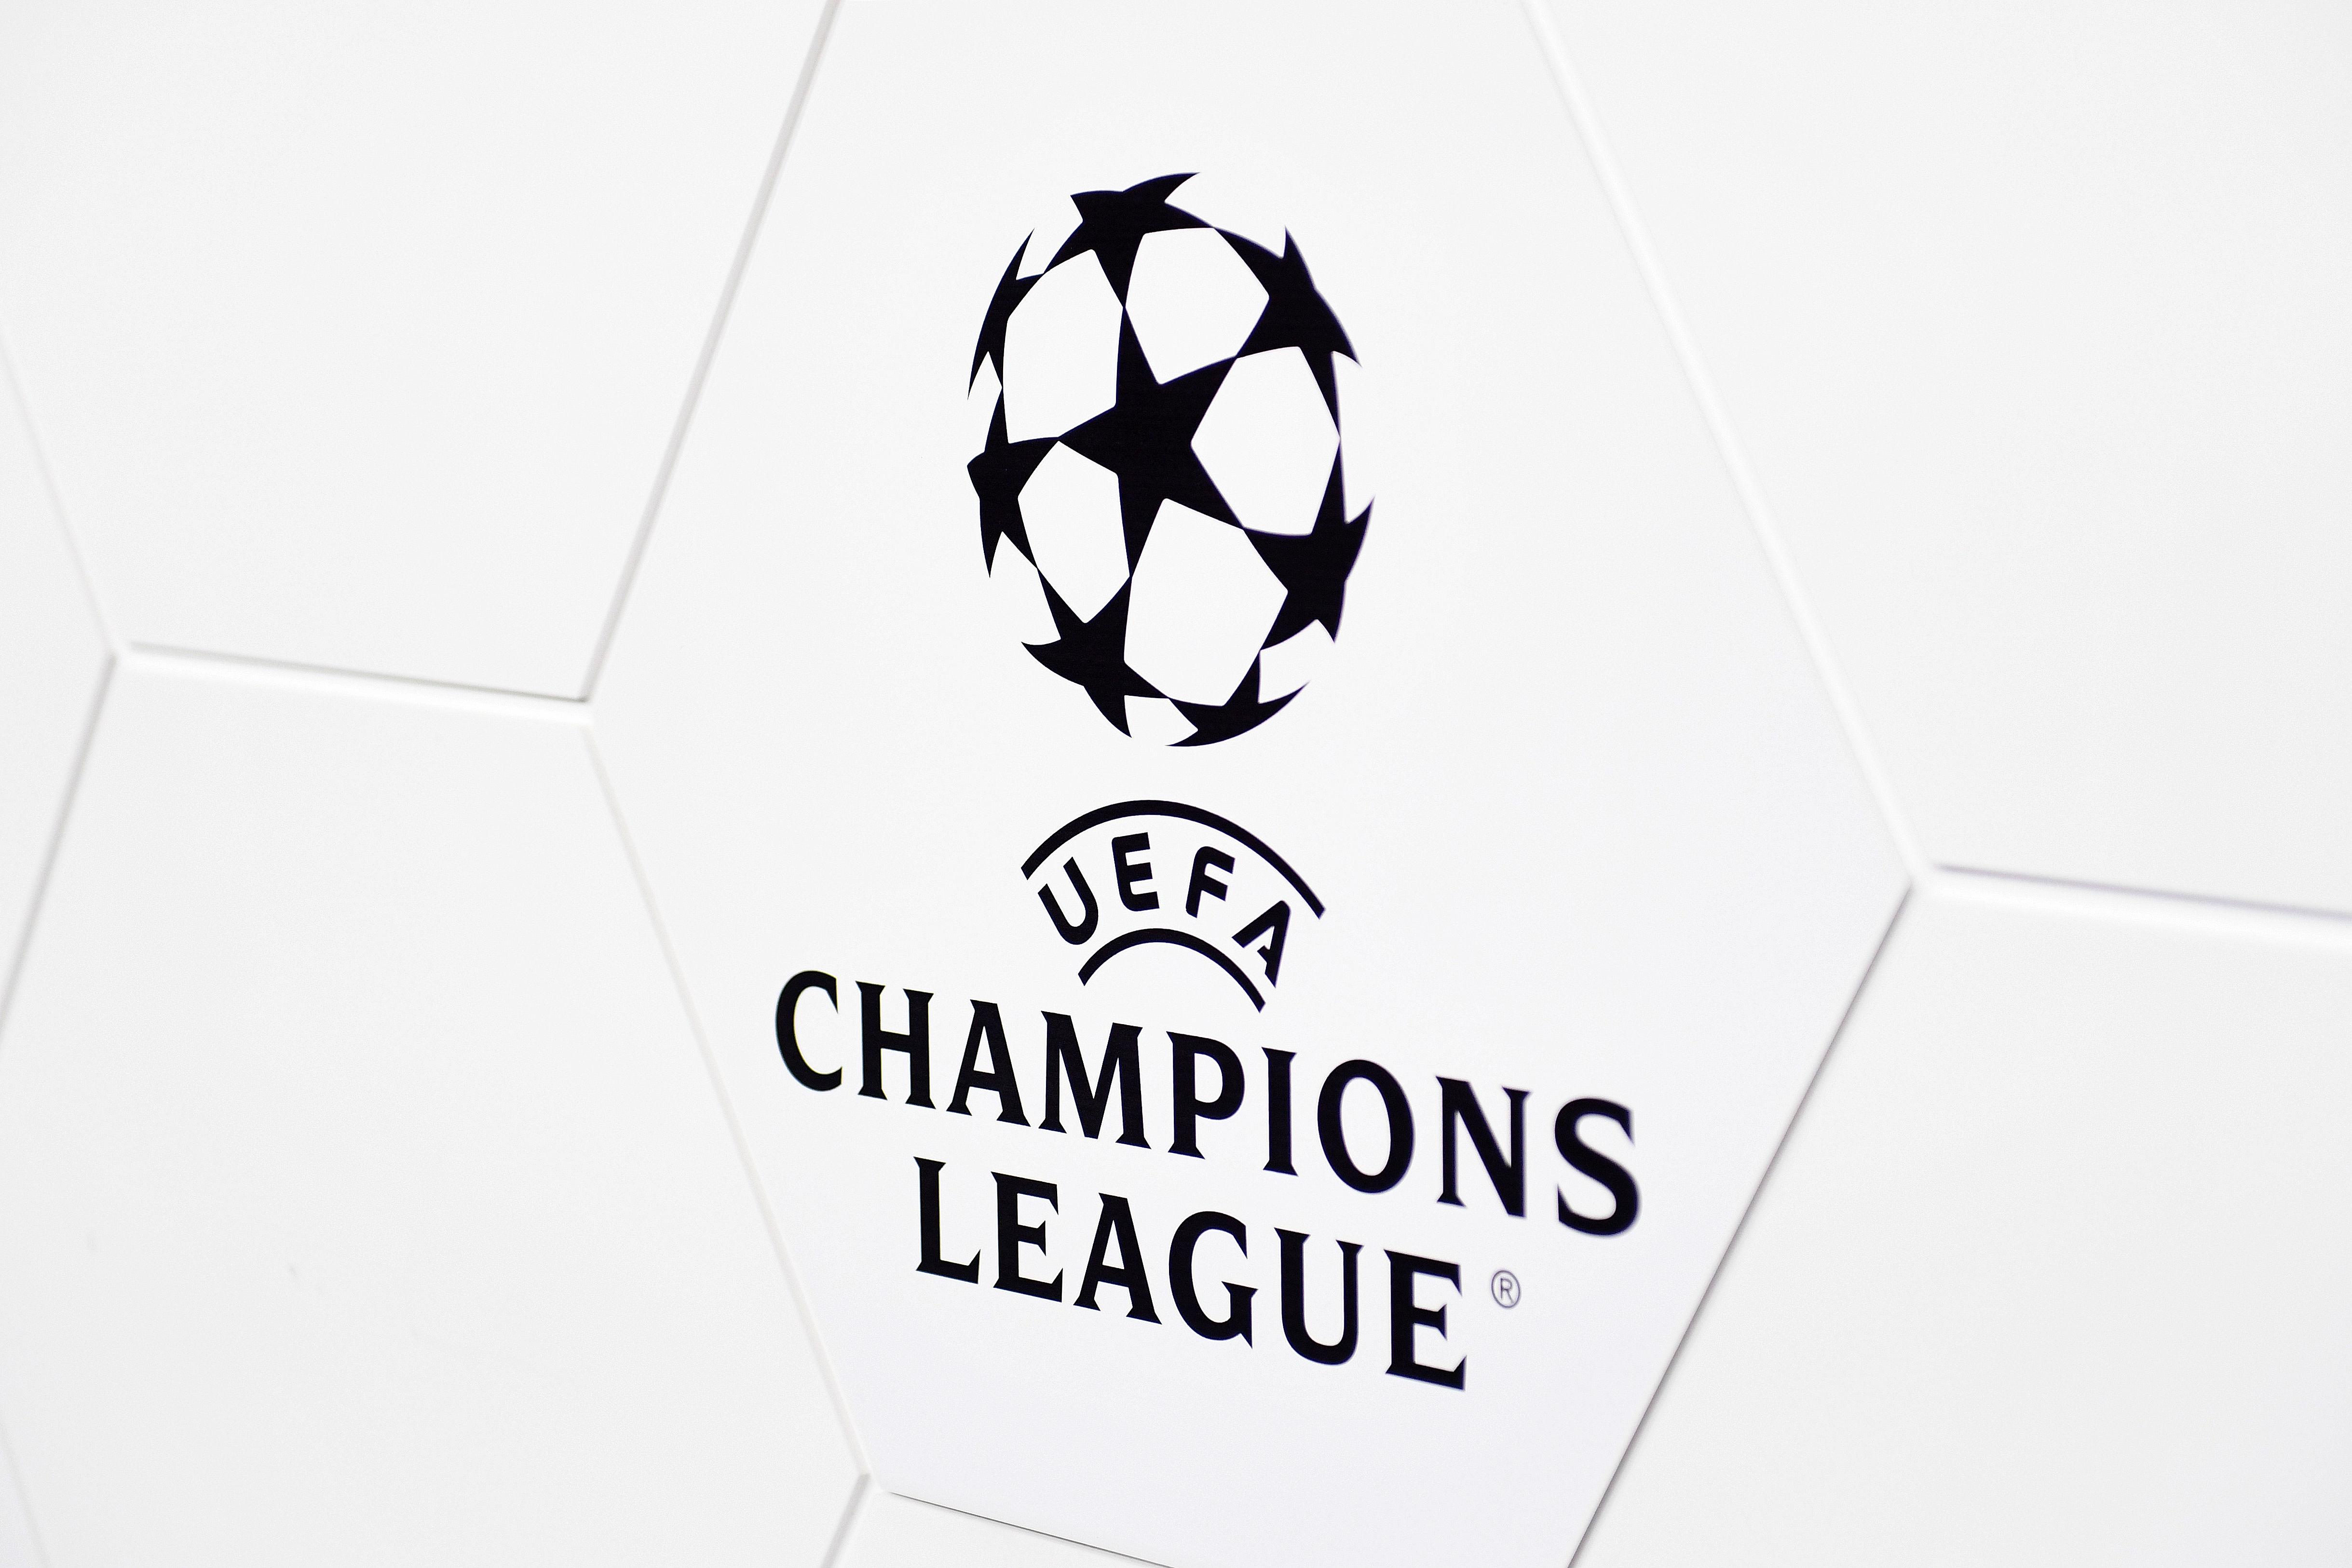 UEFA Champions League 2021/22 Preliminary Round Draw